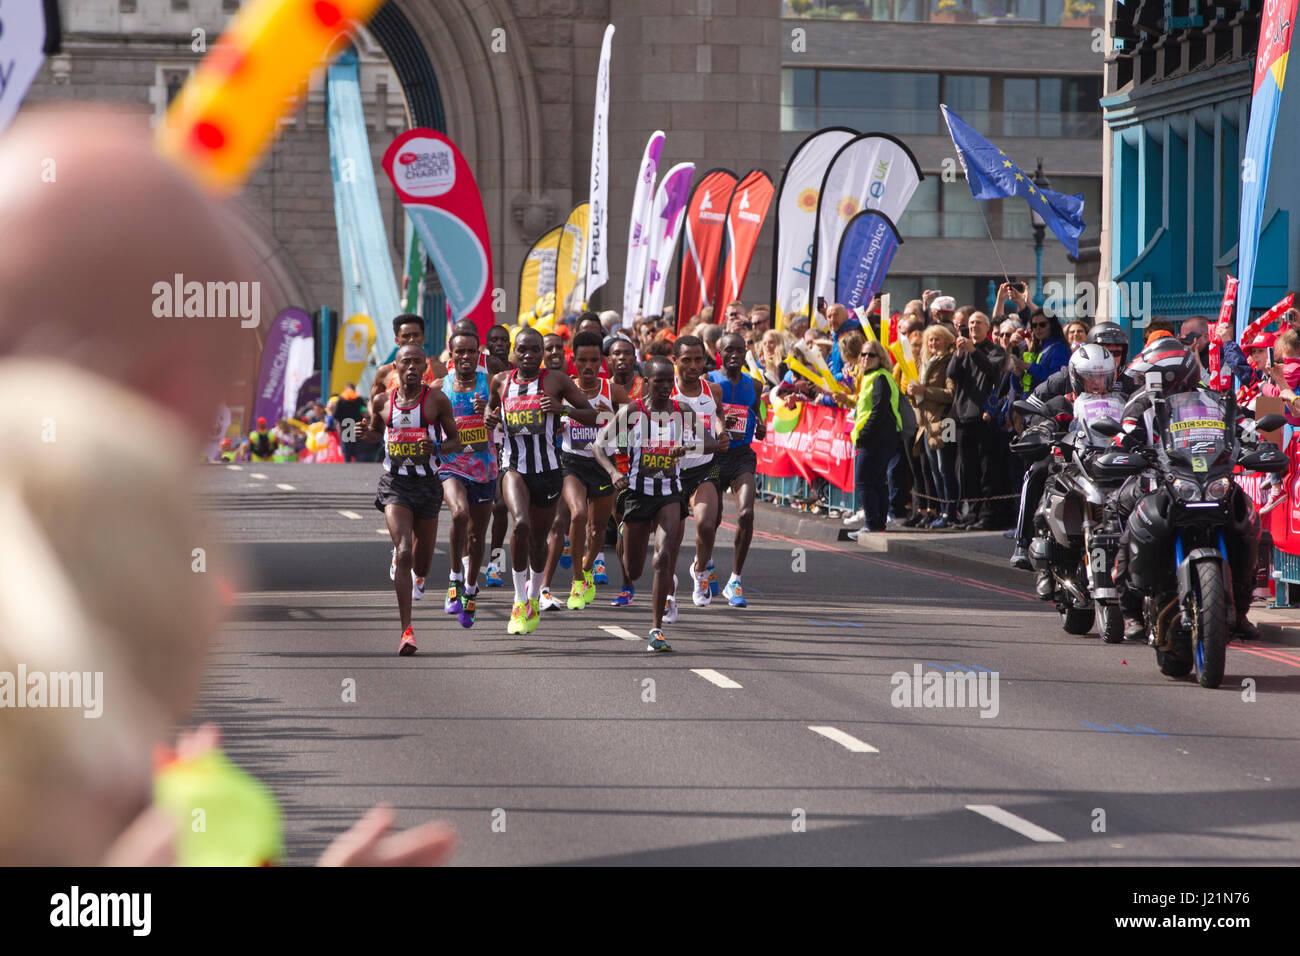 Londres, Reino Unido. 23 de abril, 2017. Maratón de Londres de 2017. Hoy se calcula que cerca de 50.000 corredores Imagen De Stock